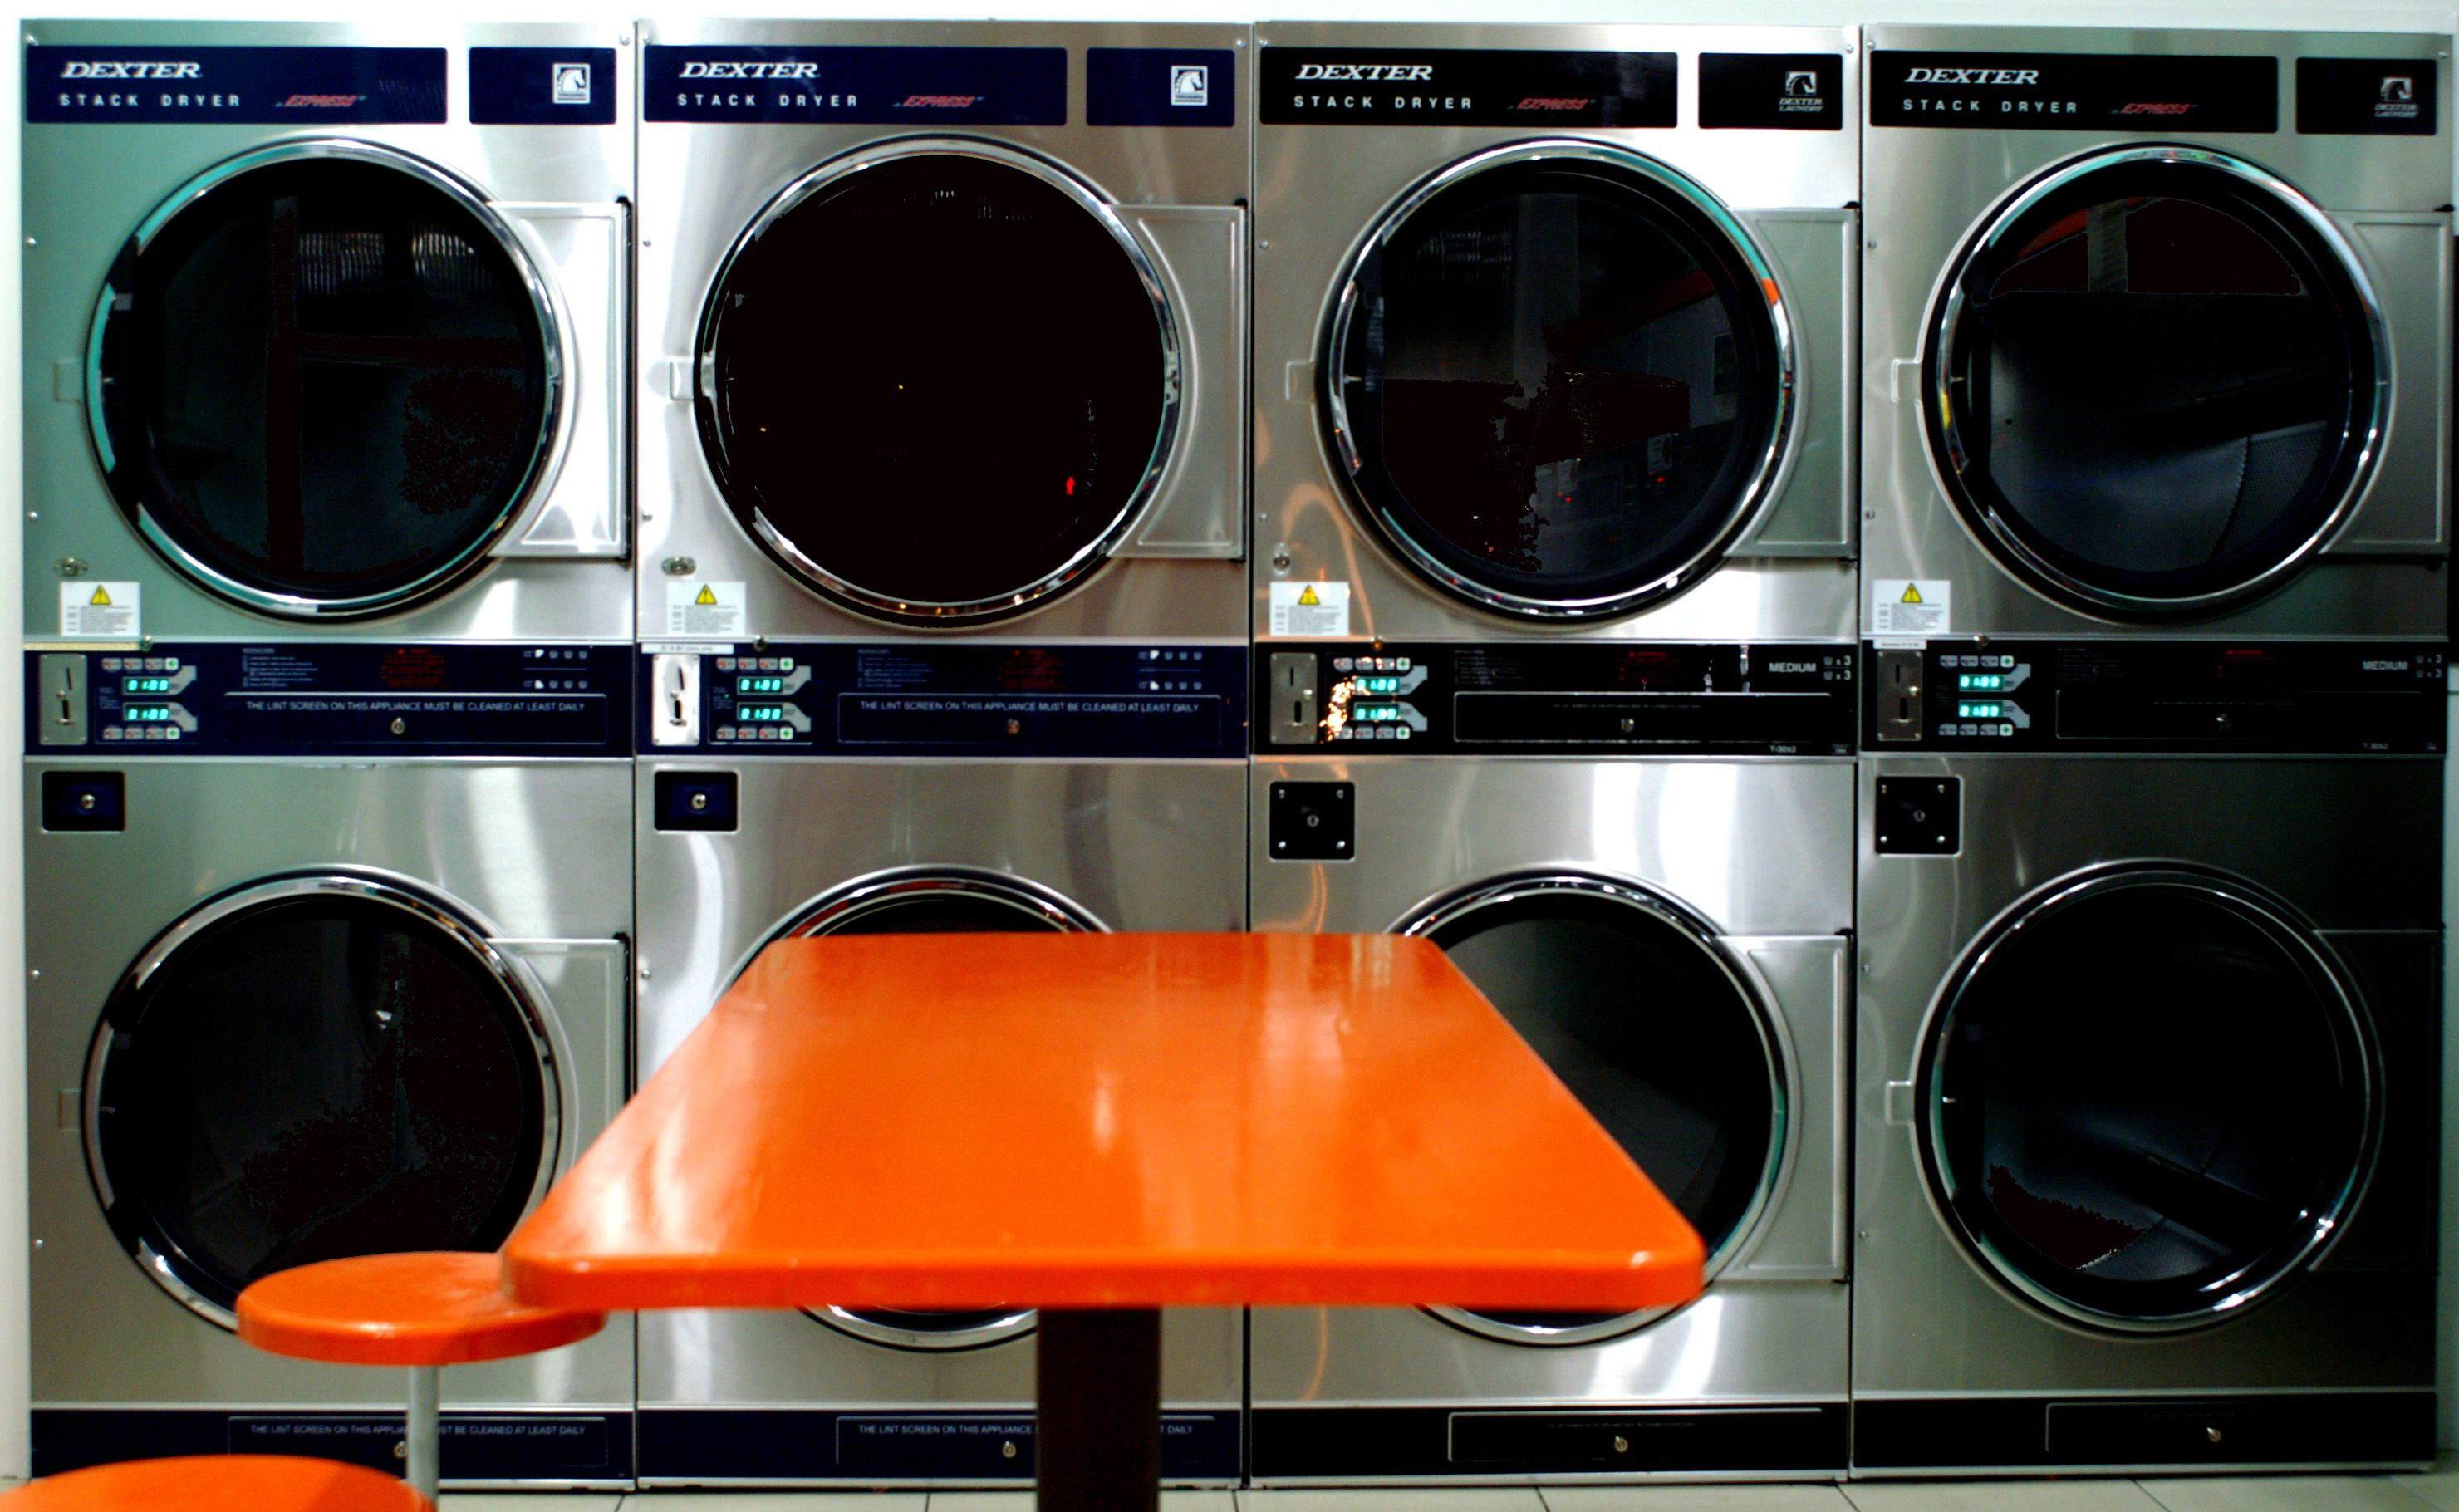 Big express dryers snaplaundromat snap laundromat